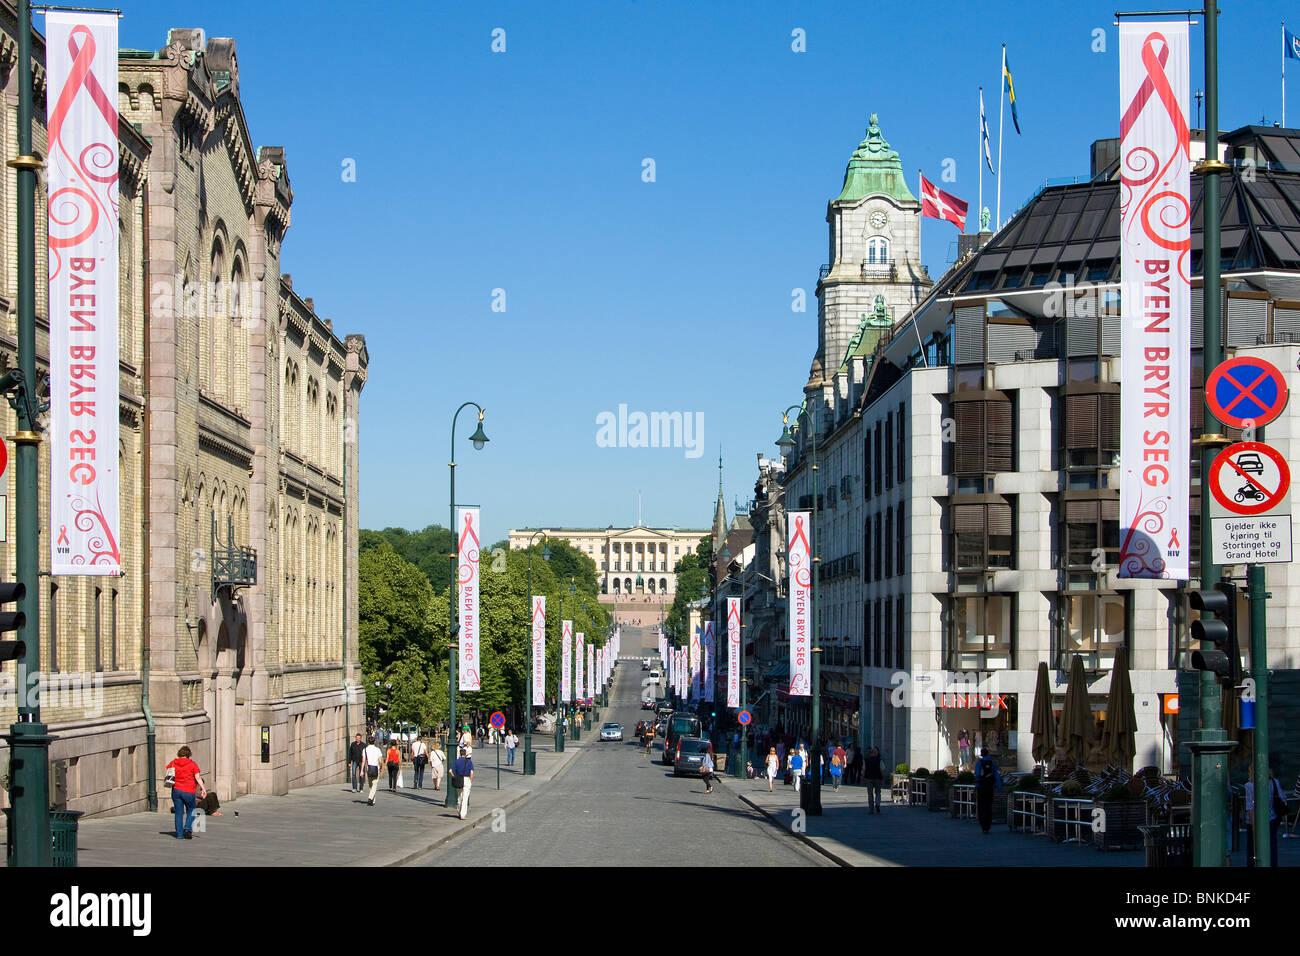 Norway Scandinavia Oslo town city Karl Johan street avenue palace royal palace travel holidays vacation tourism, - Stock Image